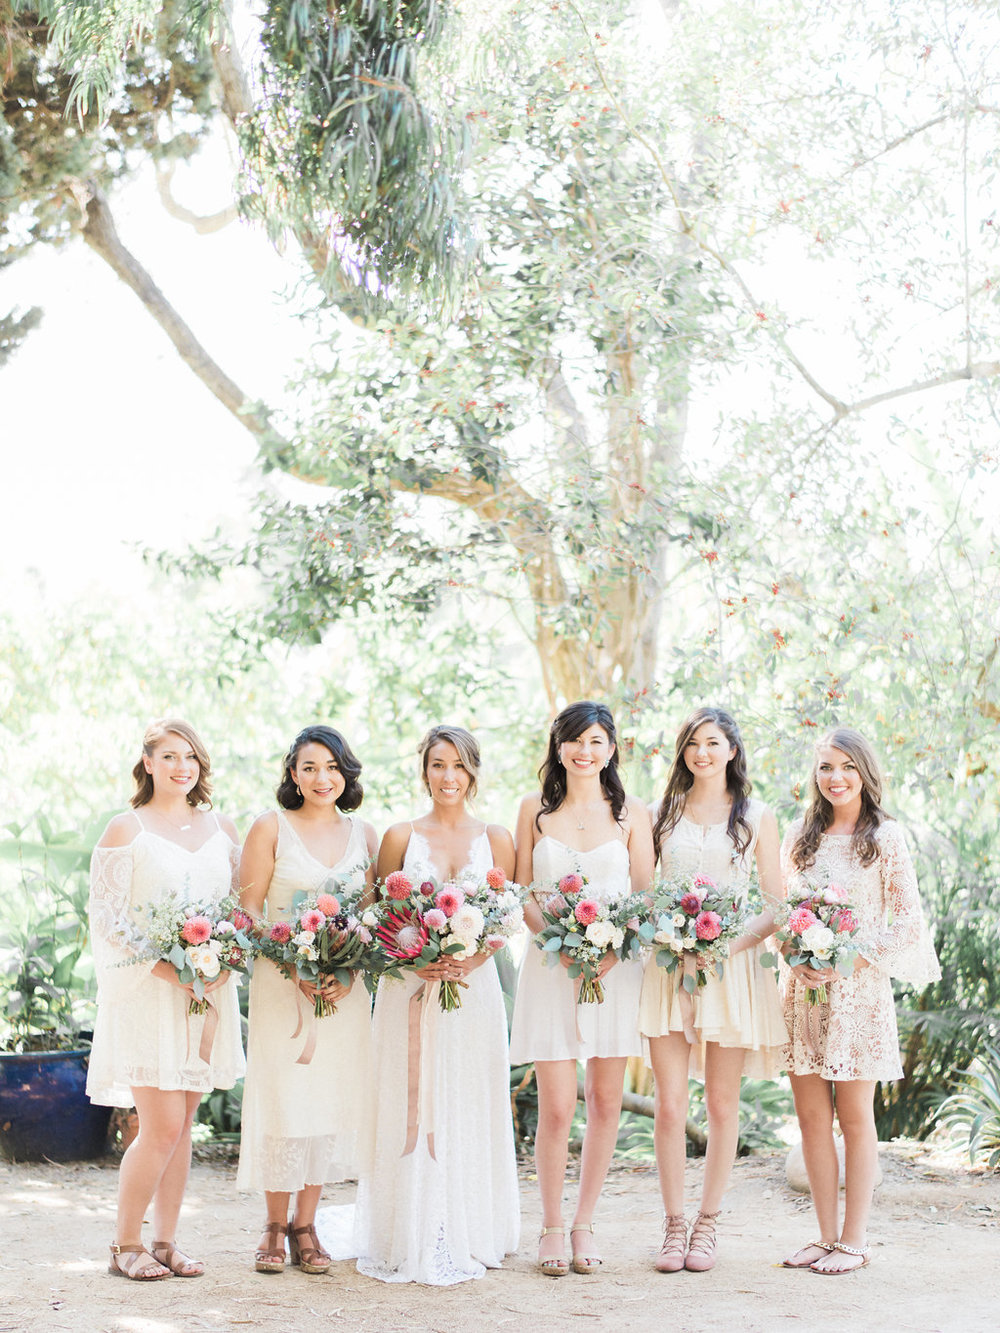 caitlynneandjoseph-wedding-184.jpg